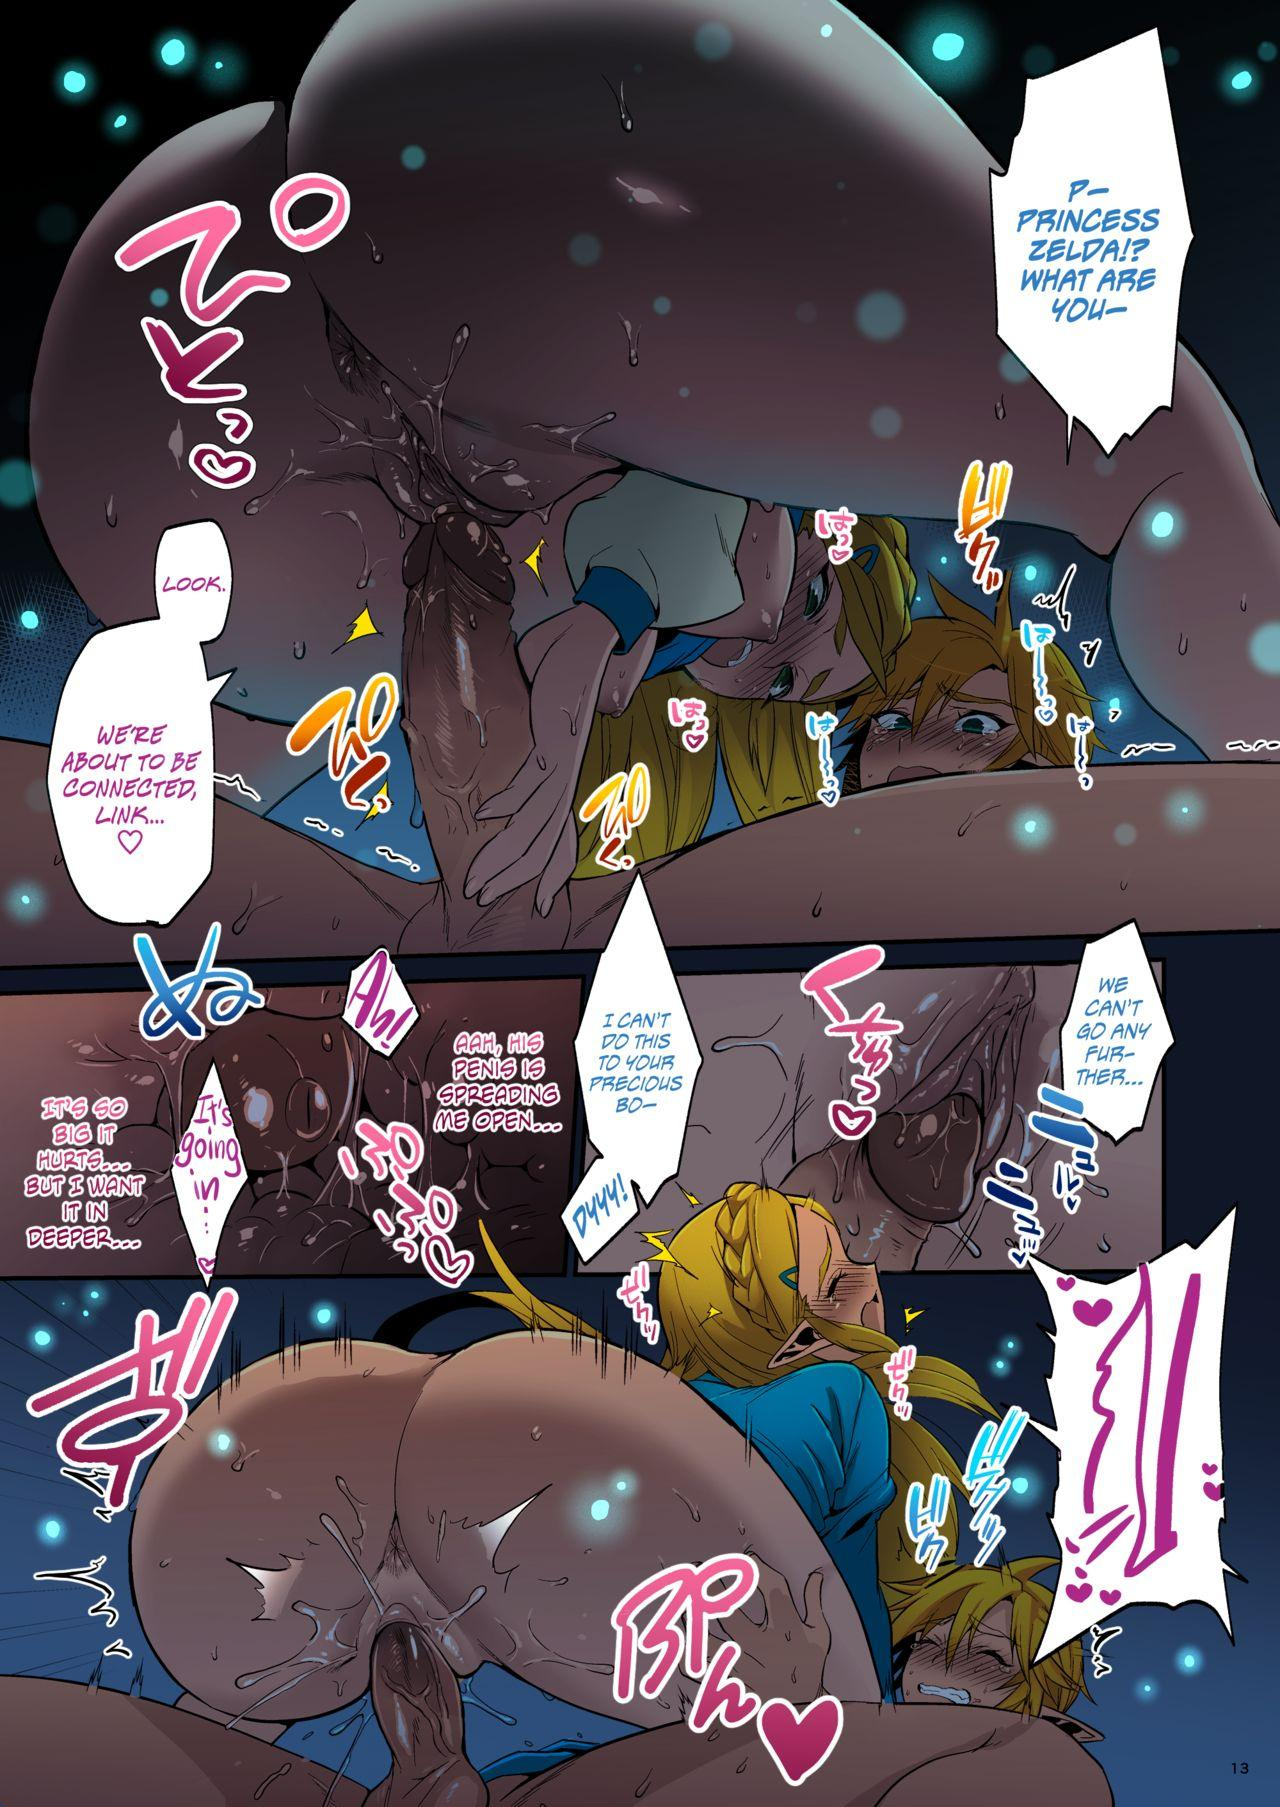 Hyrule Hanei no Tame no Katsudou!   Taking Steps to Ensure Hyrule's Prosperity! 13